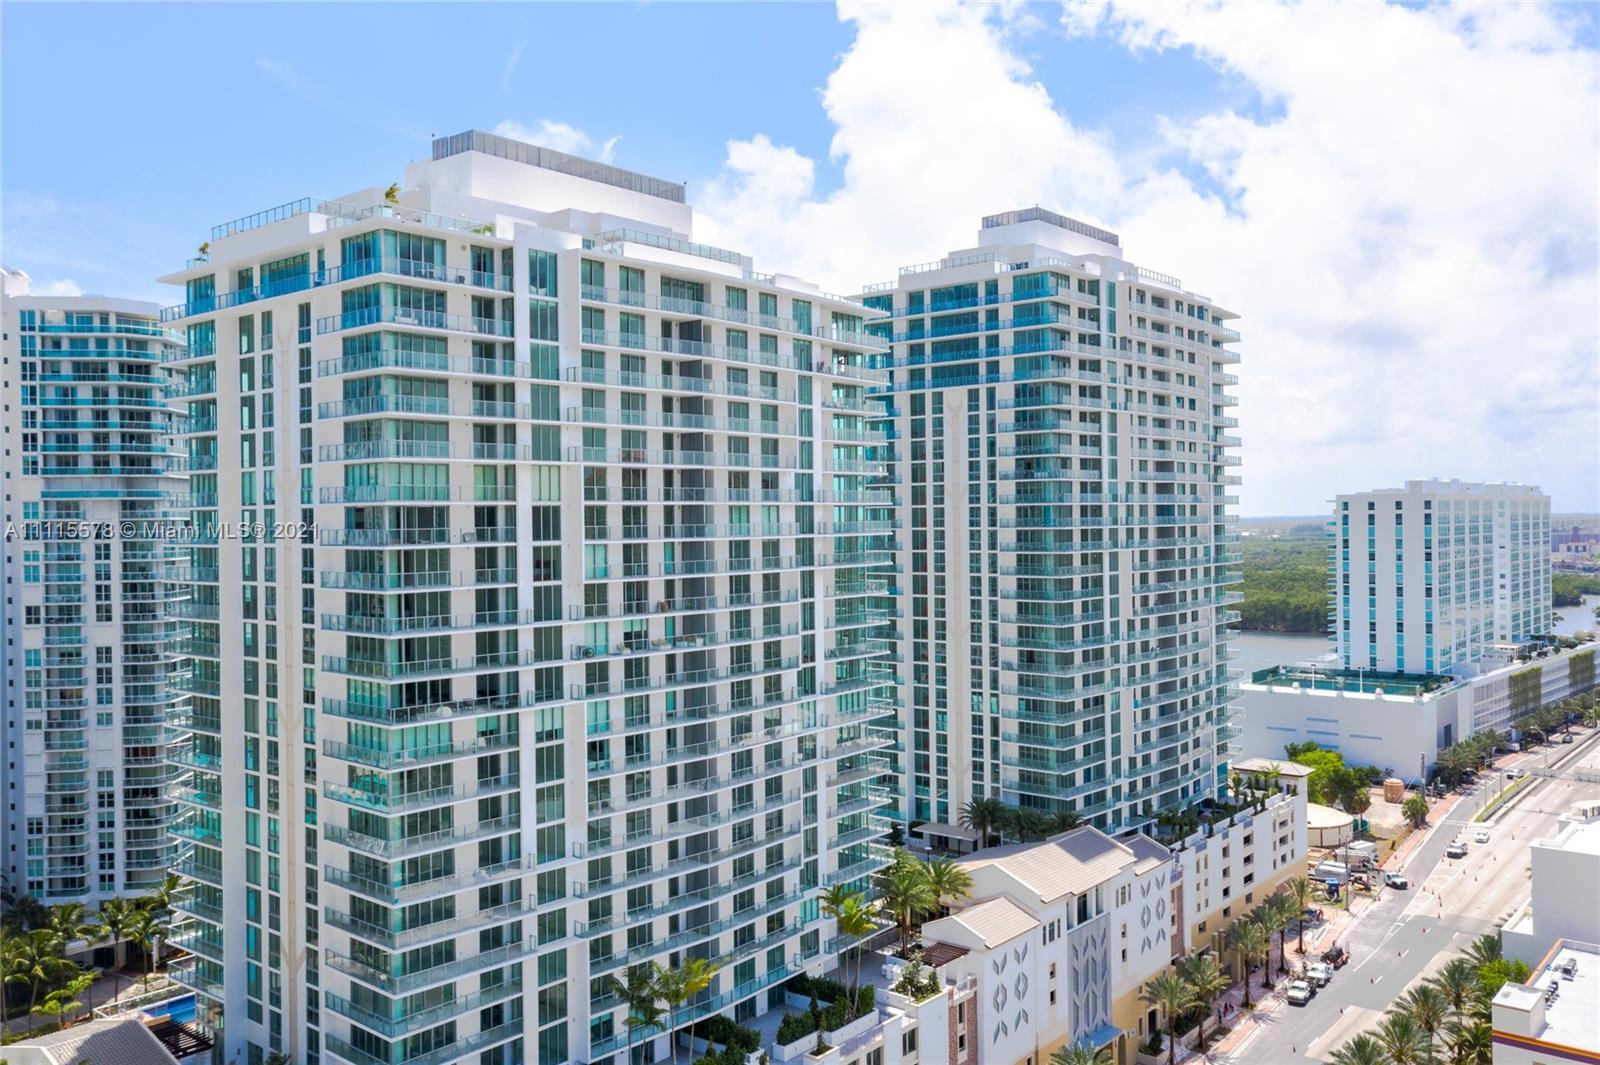 Parque Tower 2 #5-2102 - 330 Sunny Isles Blvd #5-2102, Sunny Isles Beach, FL 33160